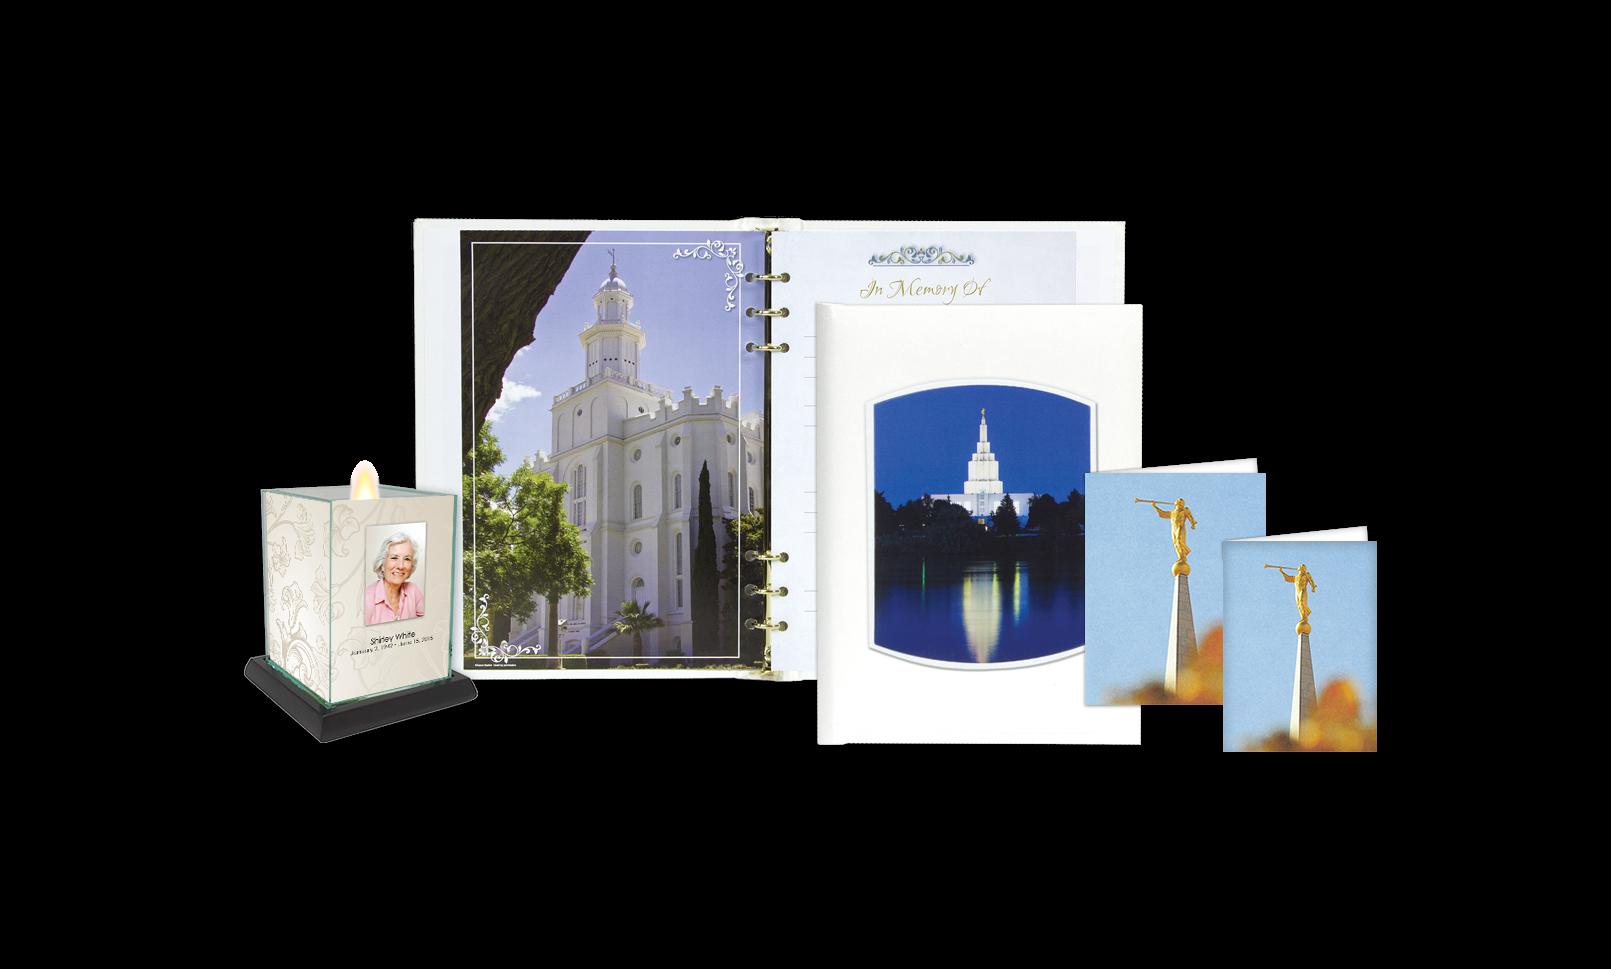 ROL Latter Day Saints Idaho Falls Temple Series 296 LDS